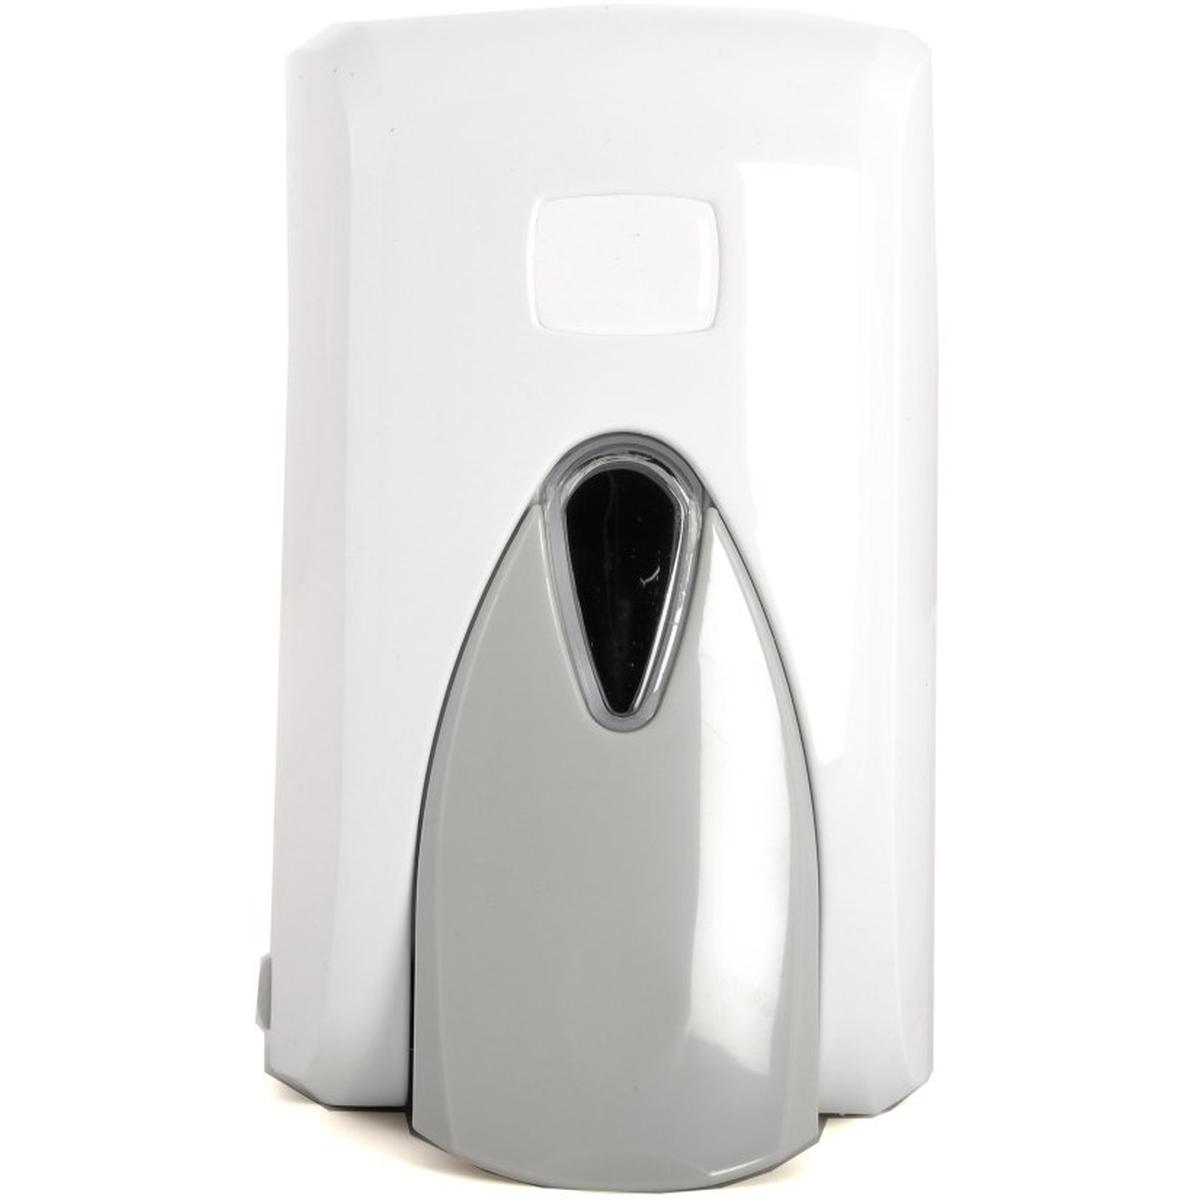 seifenspender kunststoff wei nachf llbar 500 ml semytop st 5050 11 73. Black Bedroom Furniture Sets. Home Design Ideas